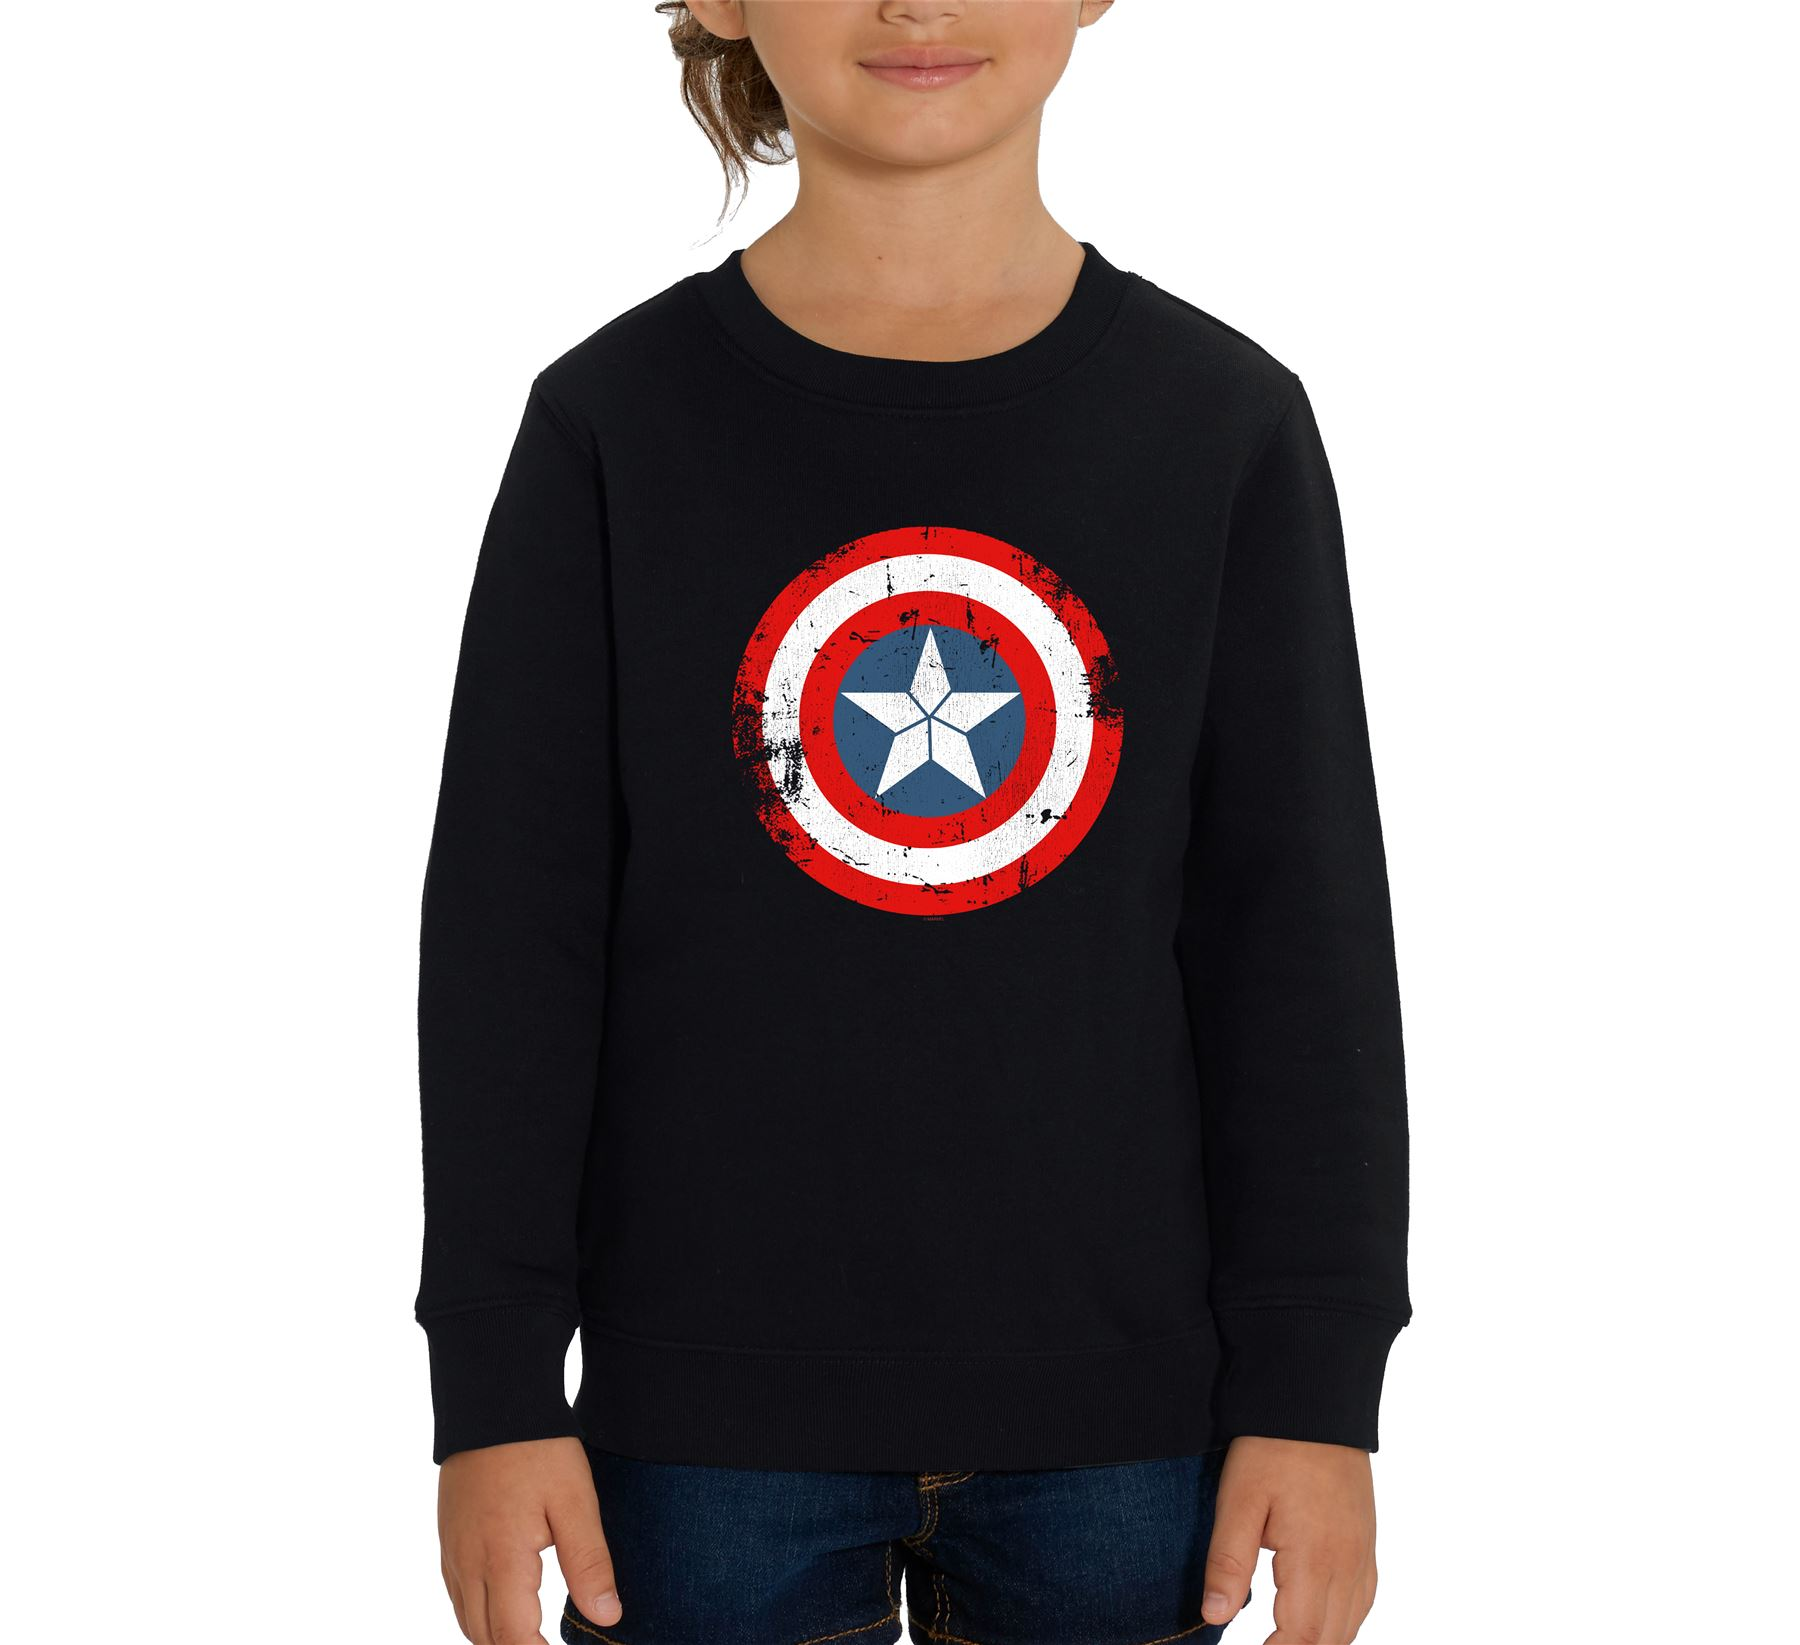 Captain Marvel Emblem Children/'s Unisex Black T-Shirt